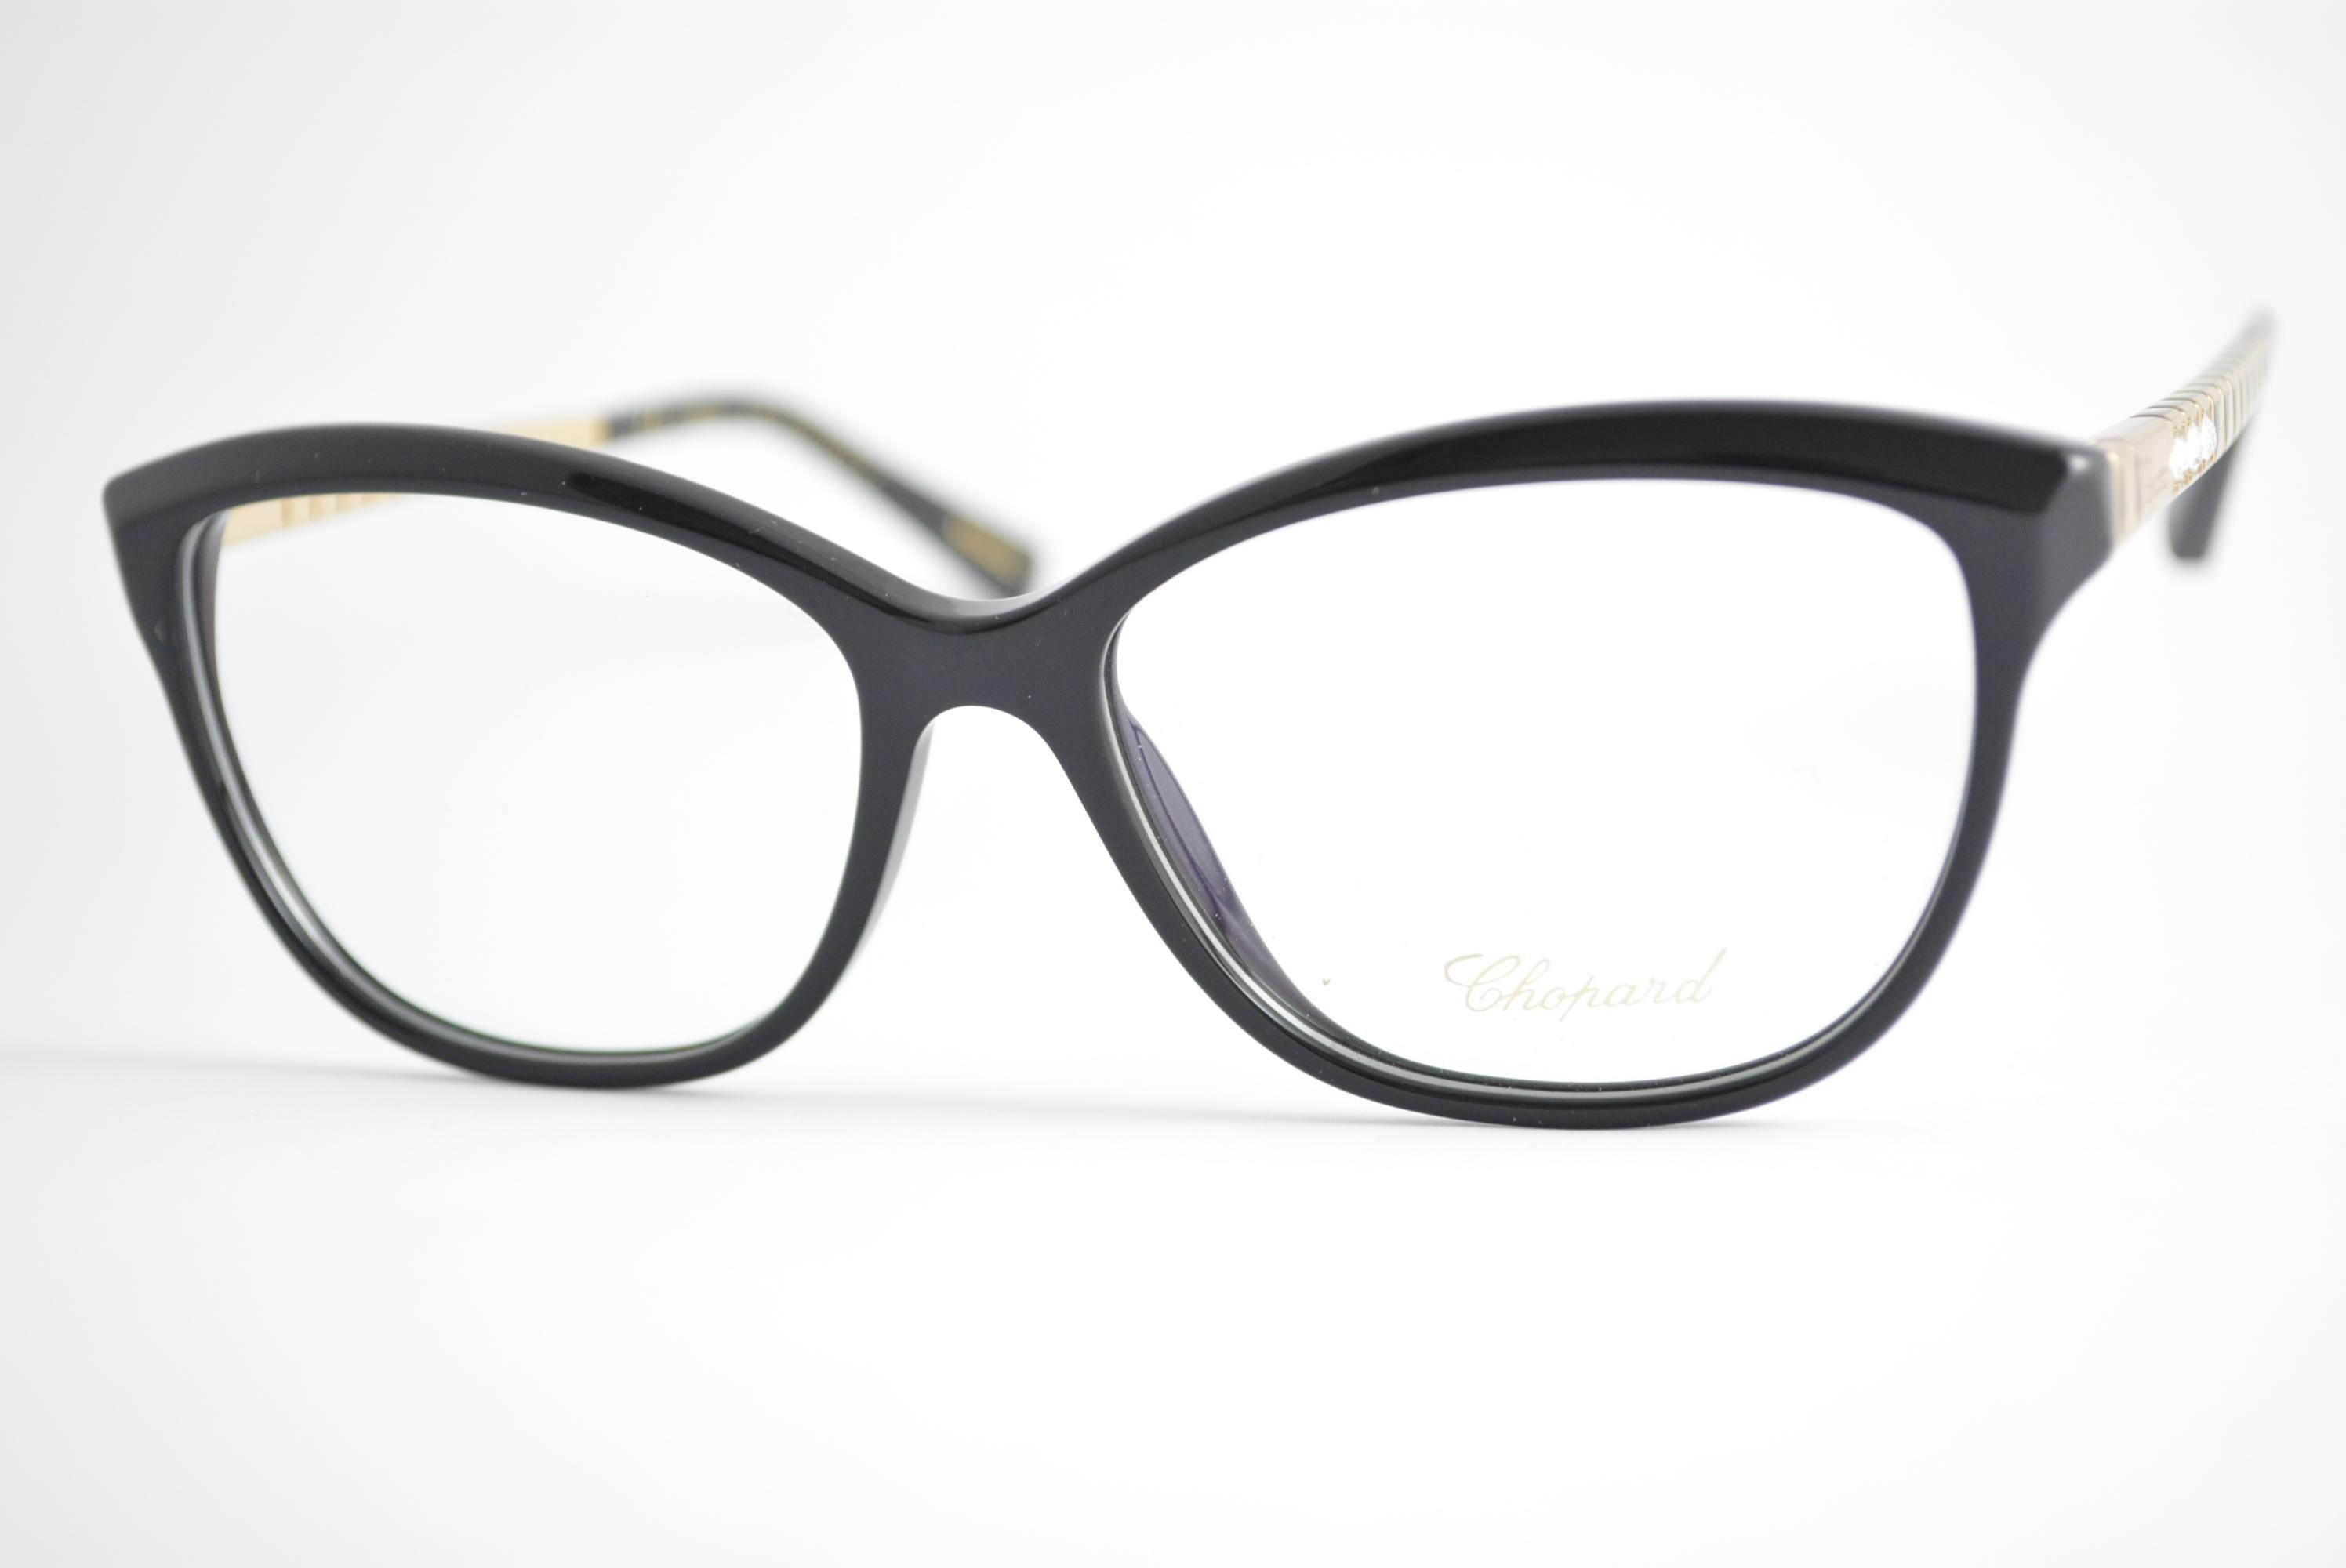 armação de óculos Chopard mod vch243s 0700